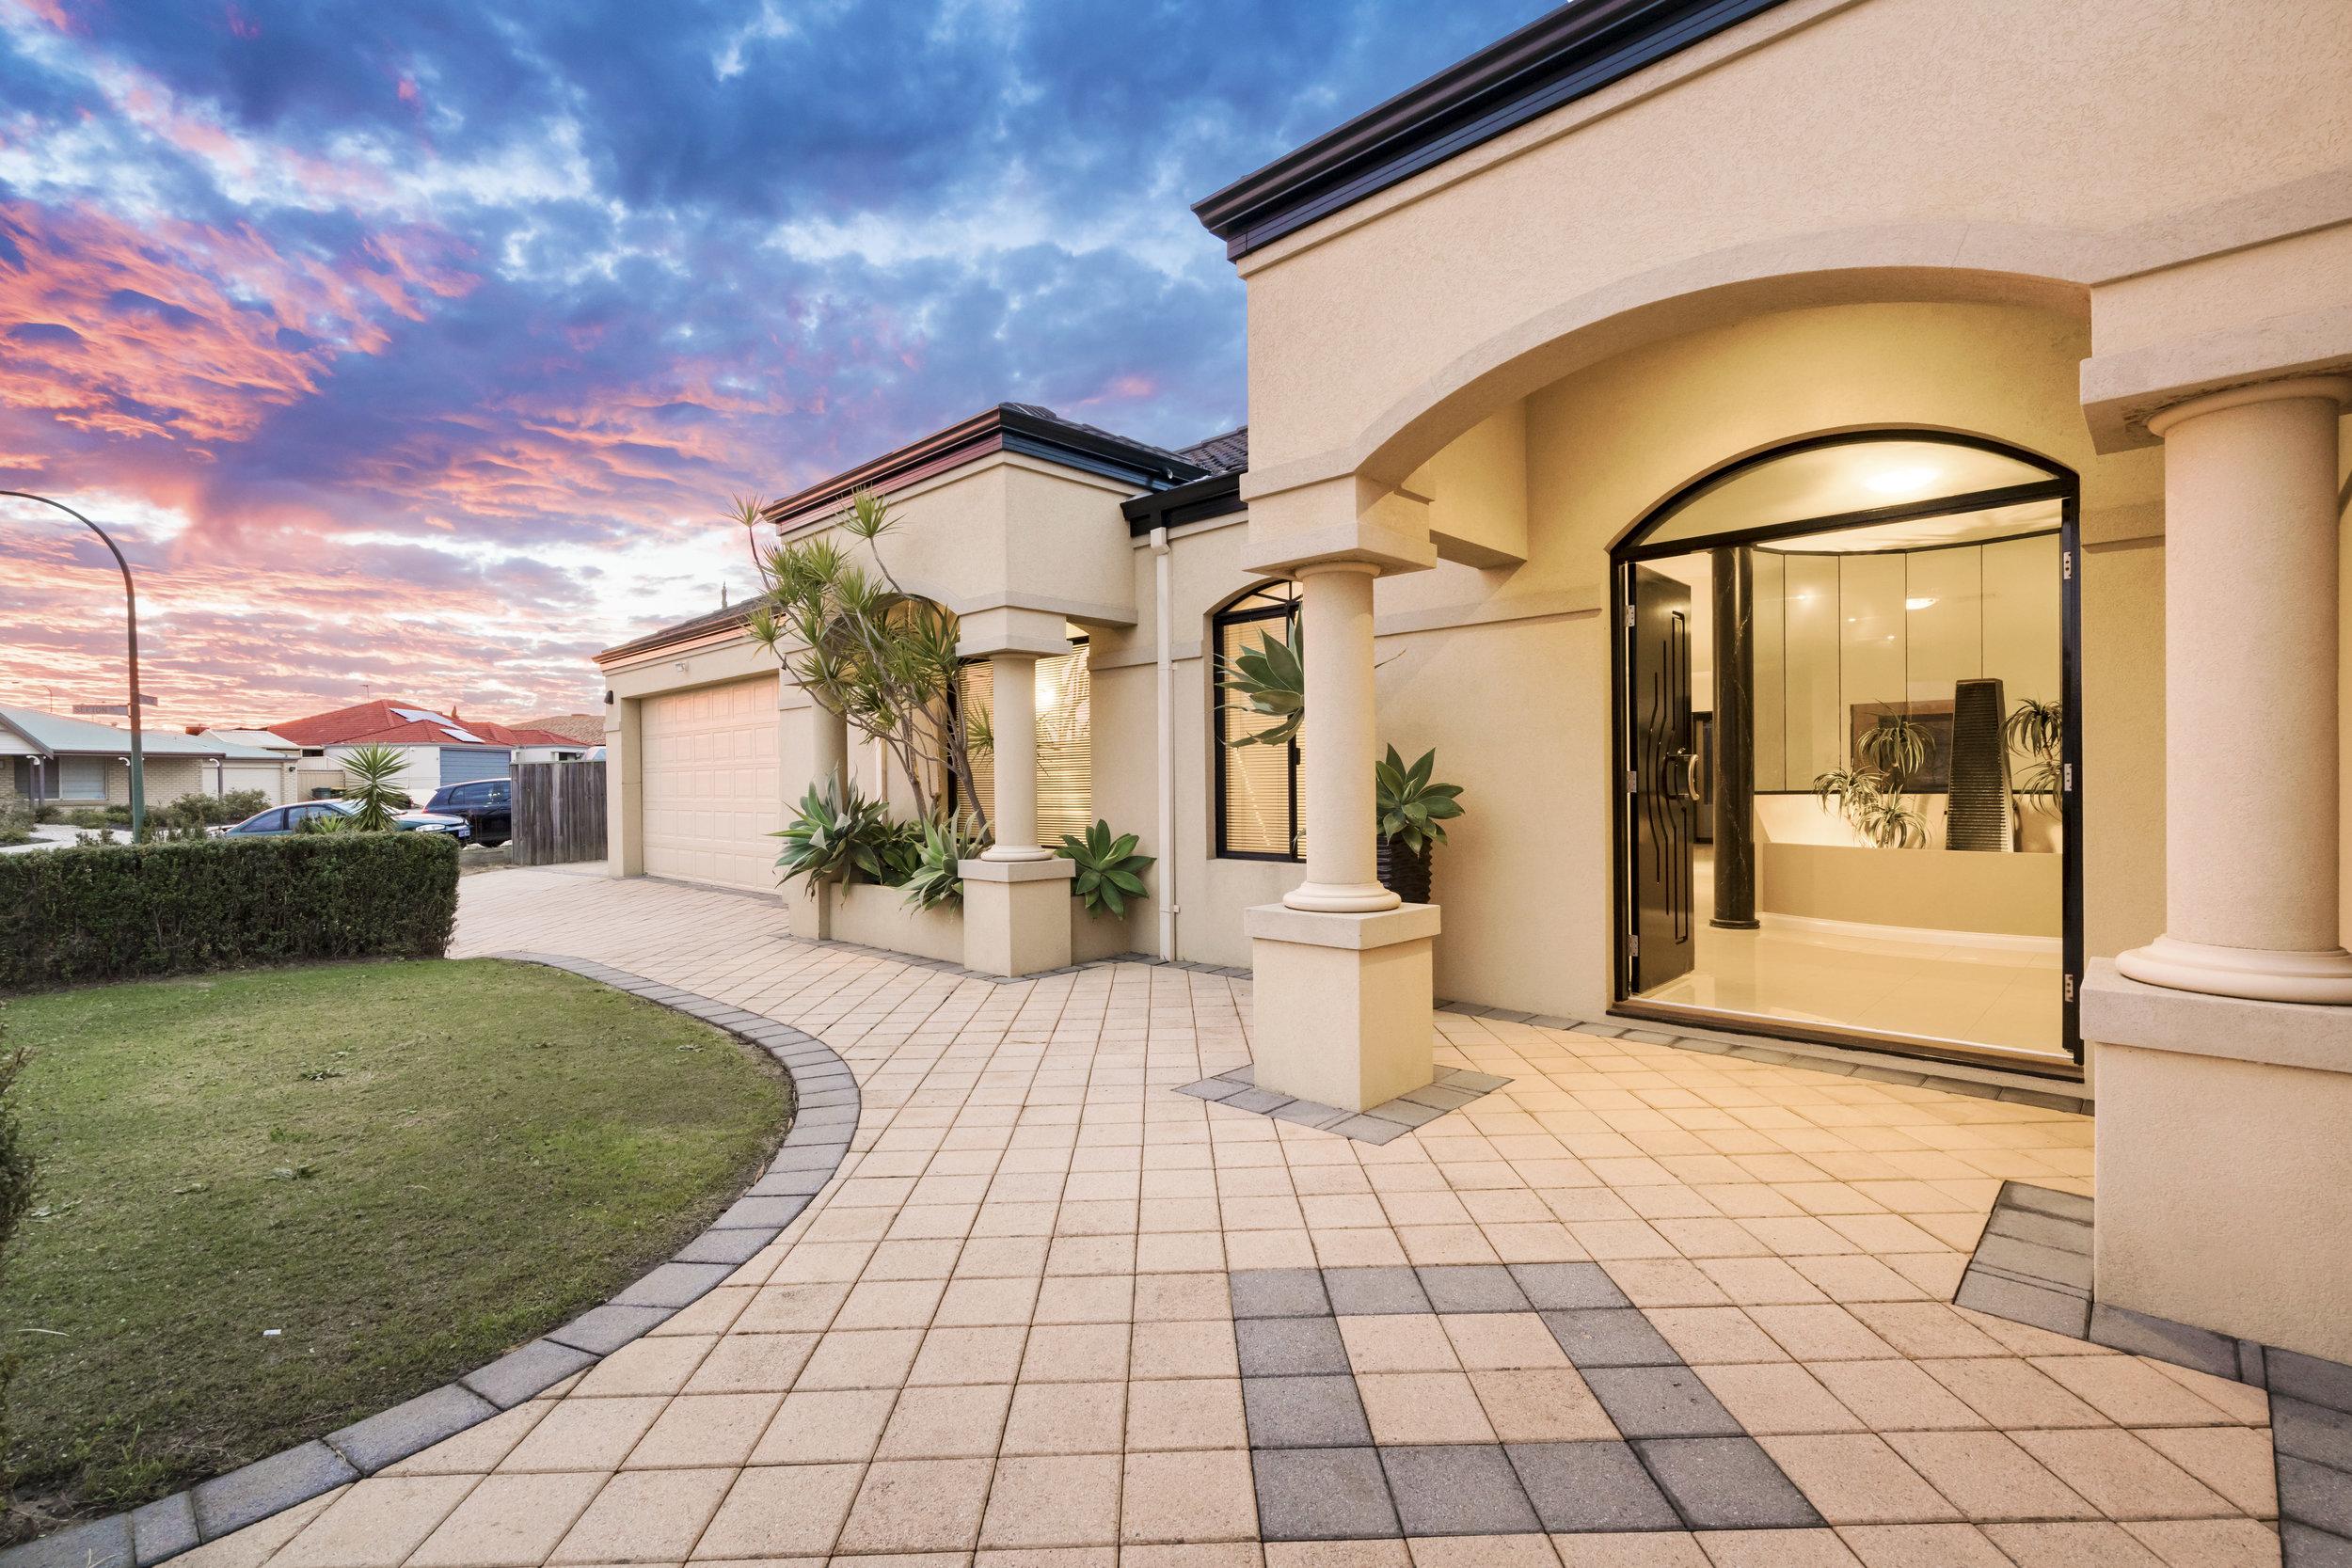 14 Firmstone Circle $655,000